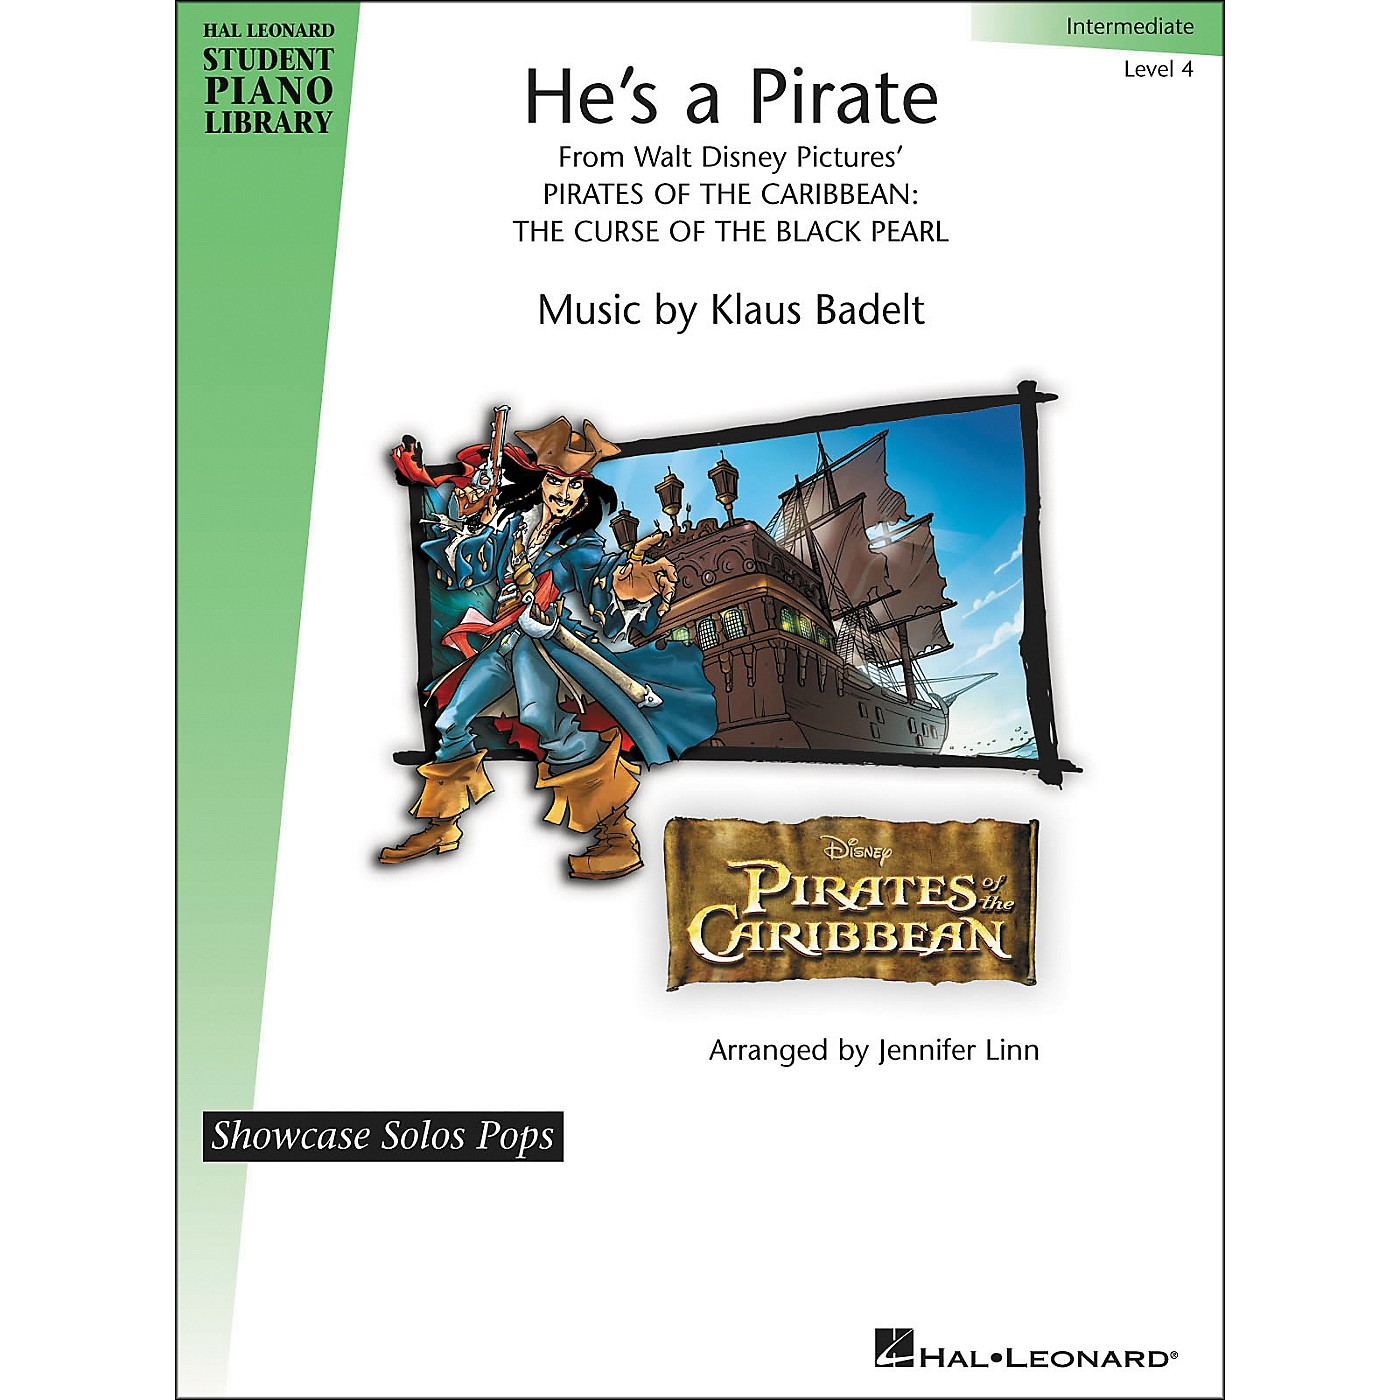 Hal Leonard He's A Pirate - Showcase Solo Pops Level 4 - Intermediate Hal Leonard Student Piano Library by Jennifer Linn thumbnail